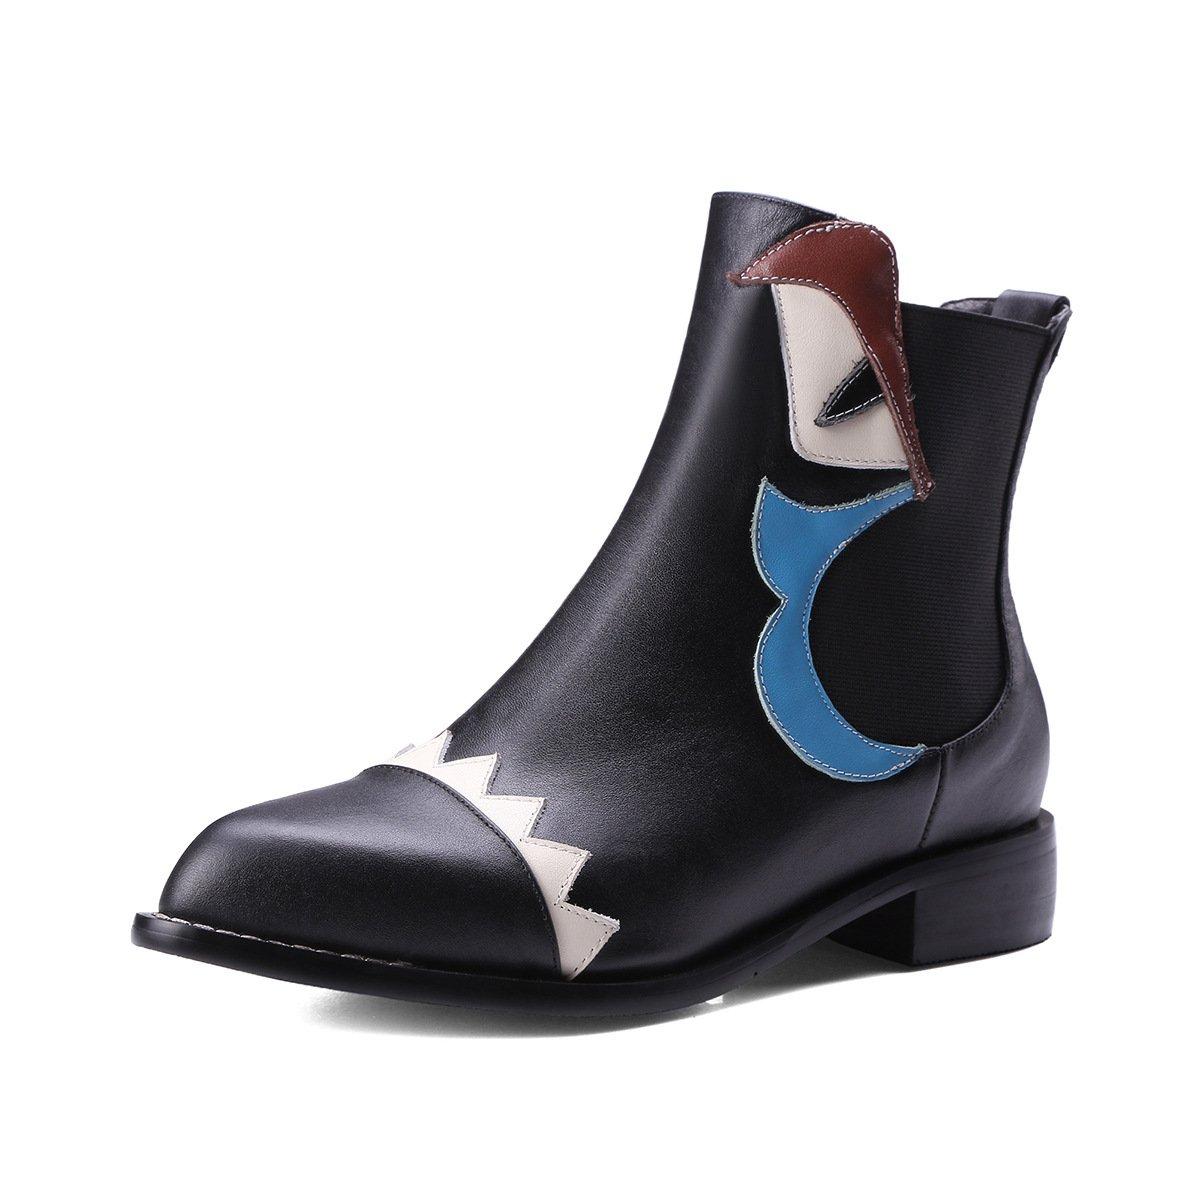 QIN&X Damens's Block Spitze Zehe kurze Ankle Stiefel Schuhe schwarz